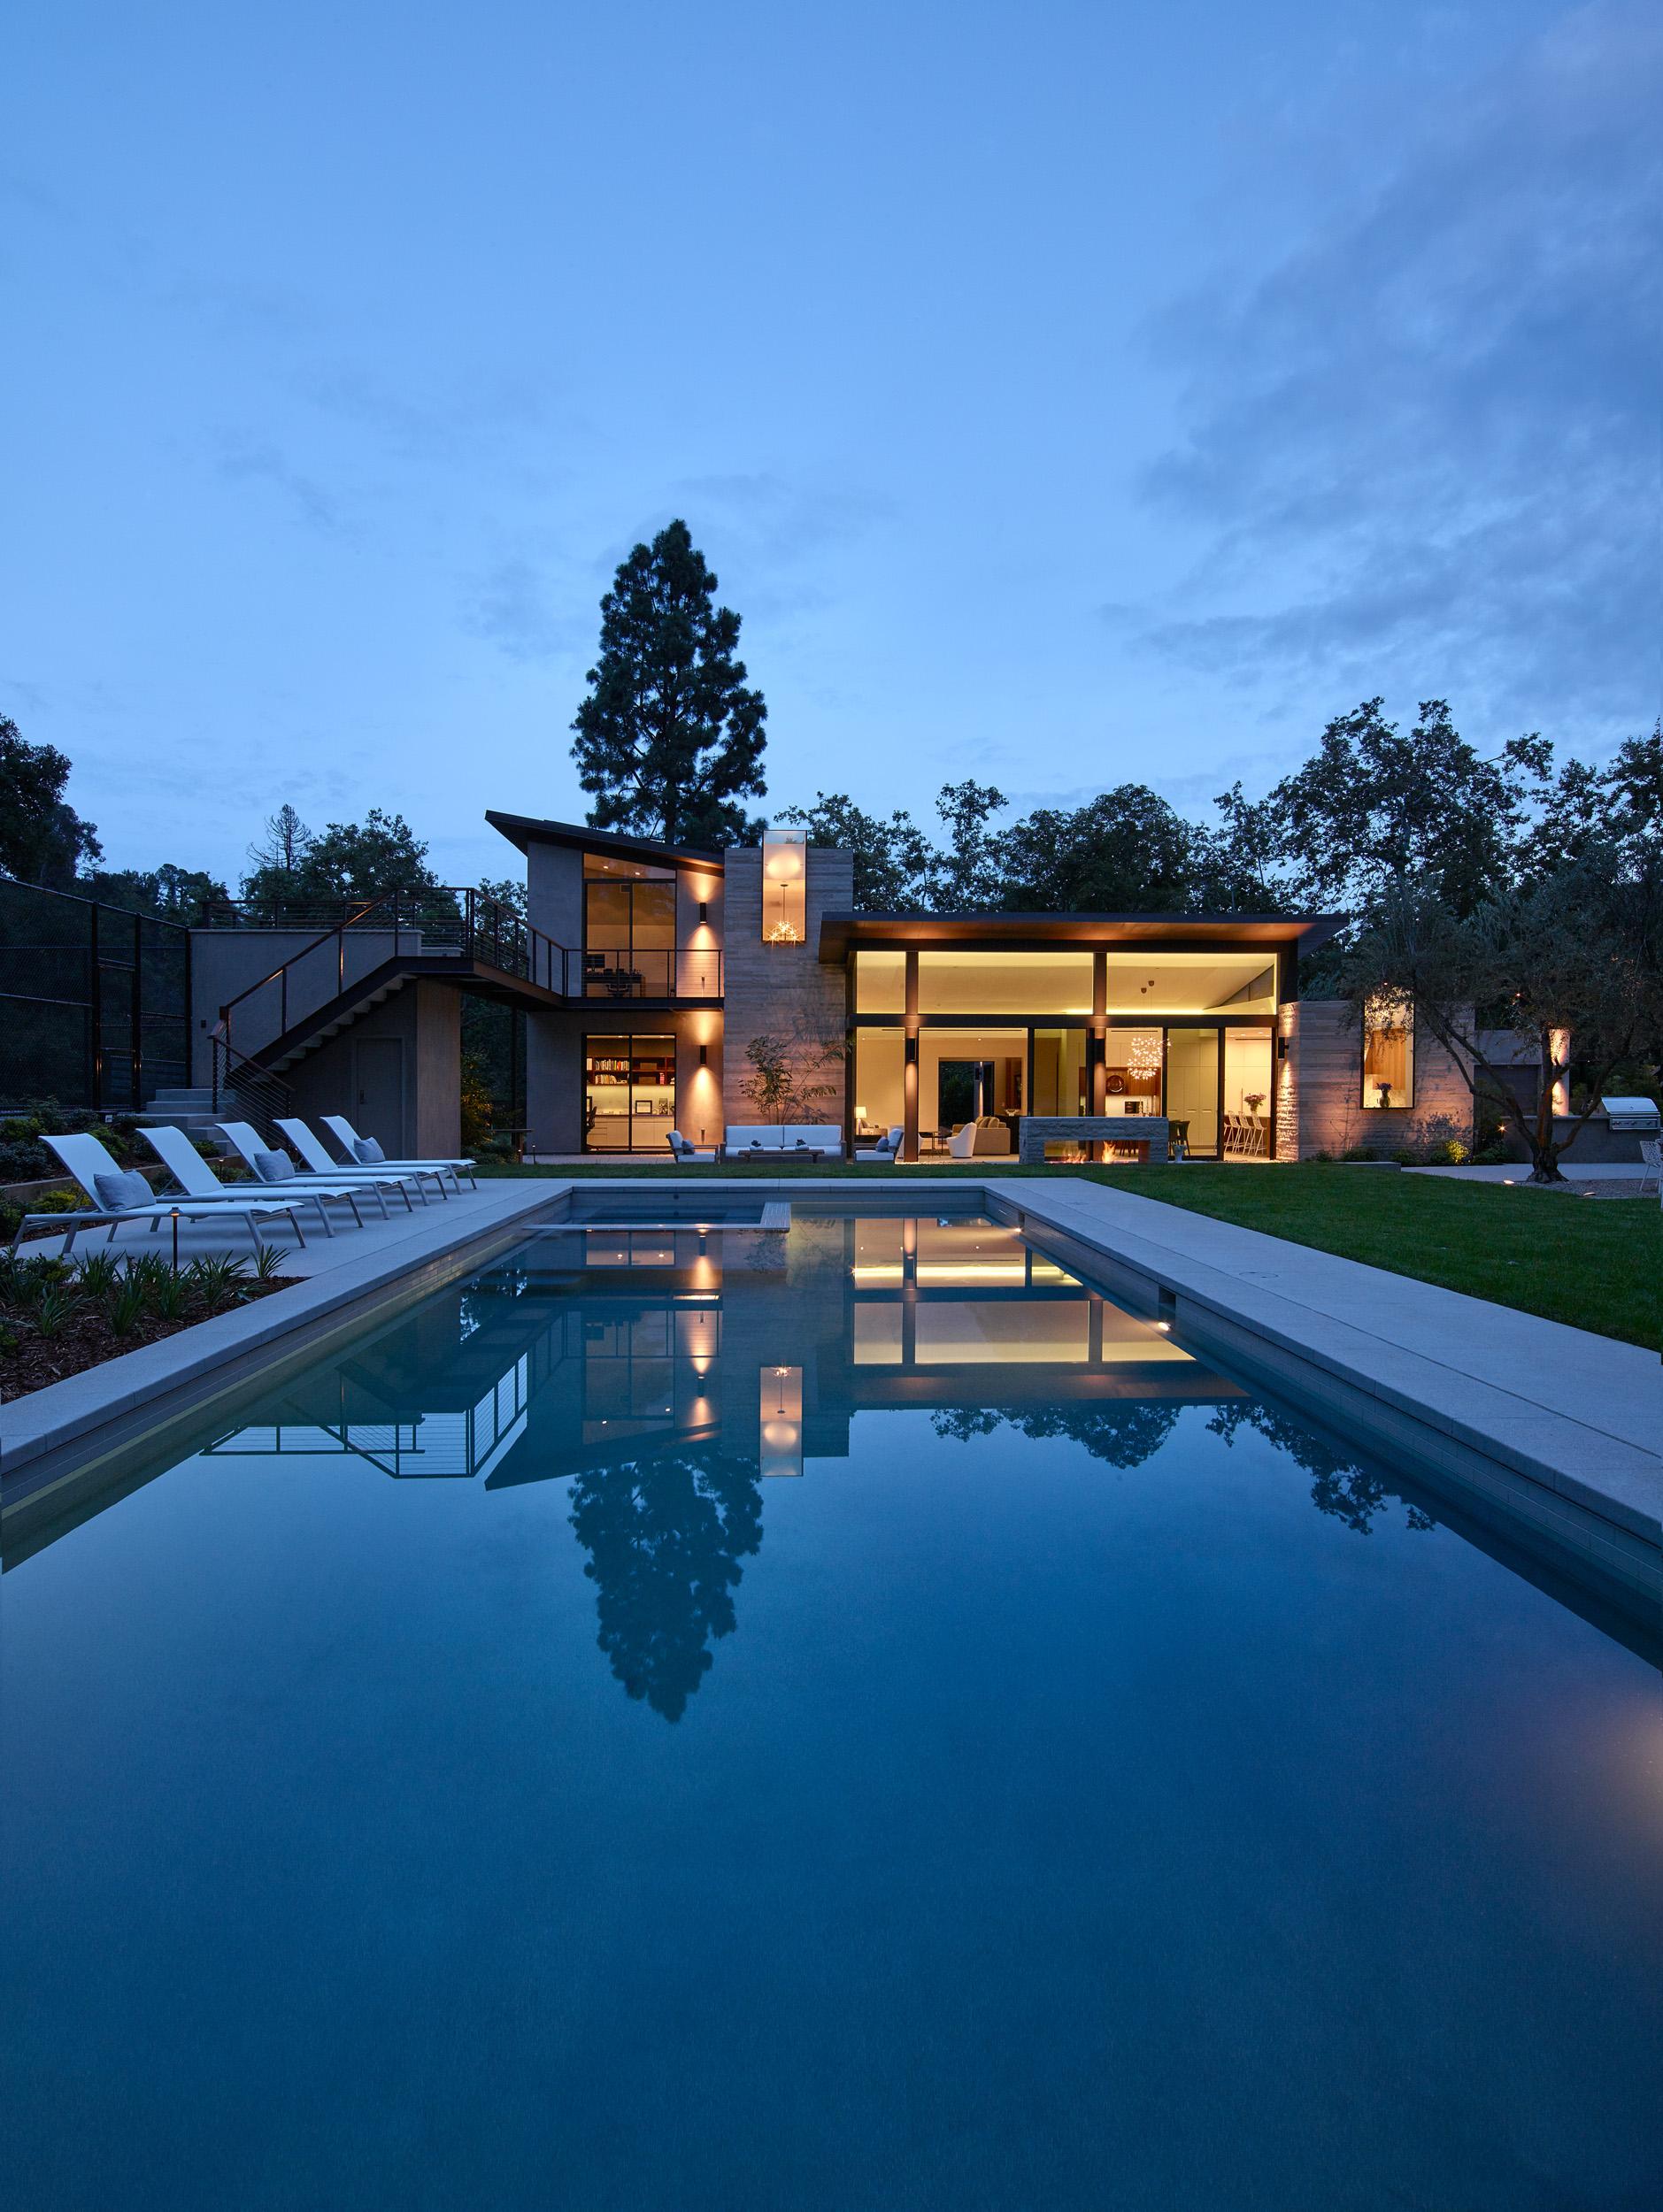 Mandeville house at twilight